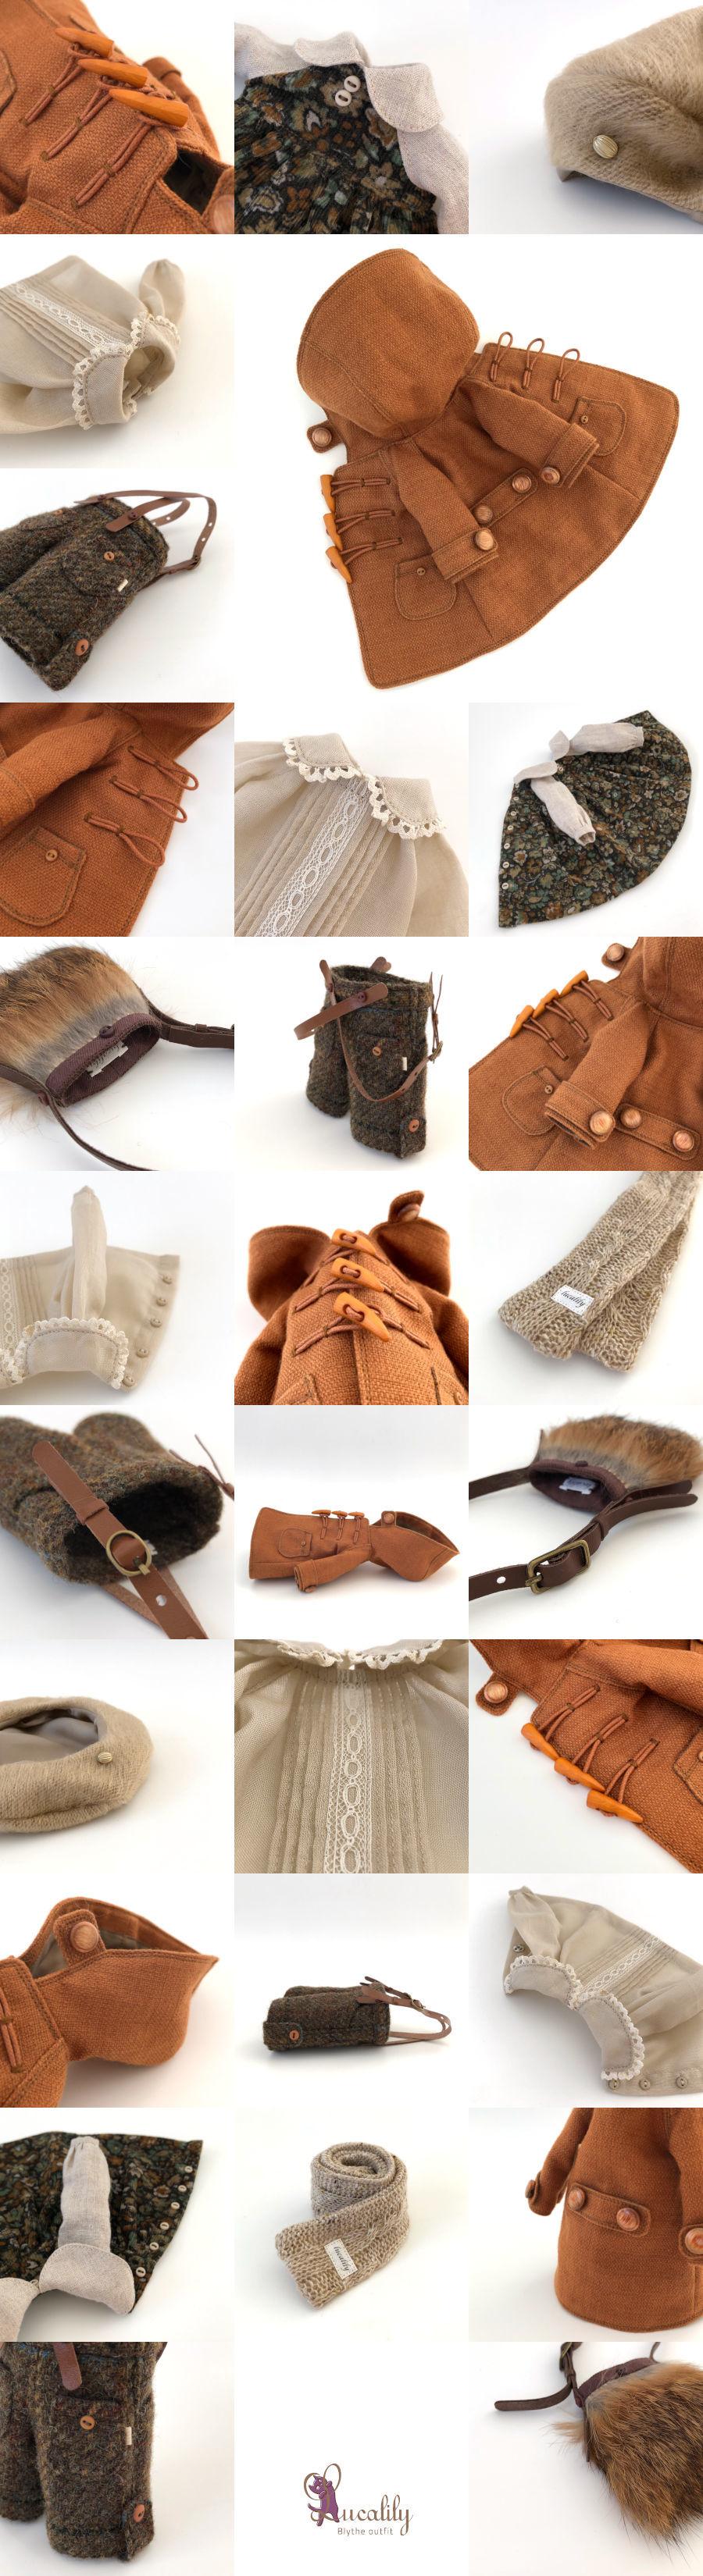 *lucalily * dolls clothes * Brown duffle coat set *_d0217189_10164731.jpeg